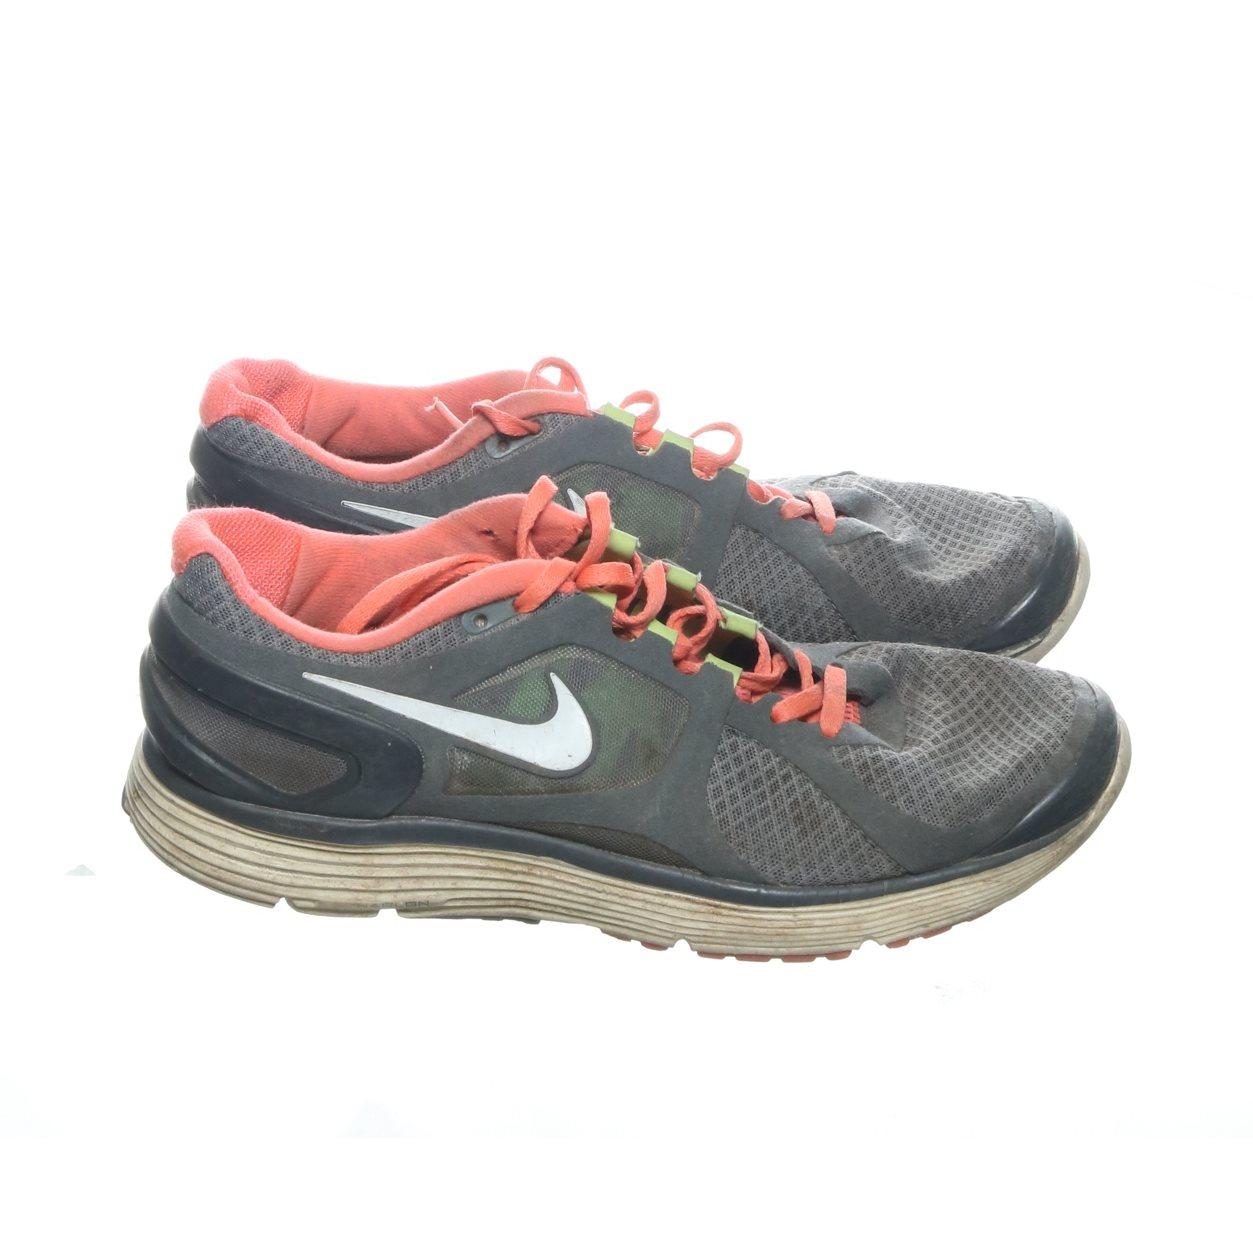 san francisco 7b829 3fb2e ... Dam Sverige Nike LunarTempo Löparskor CrimsonVoltVitLight  new styles  ee4a5 ae00e Nike, Träningsskor, Strl 40, GråRosaVit